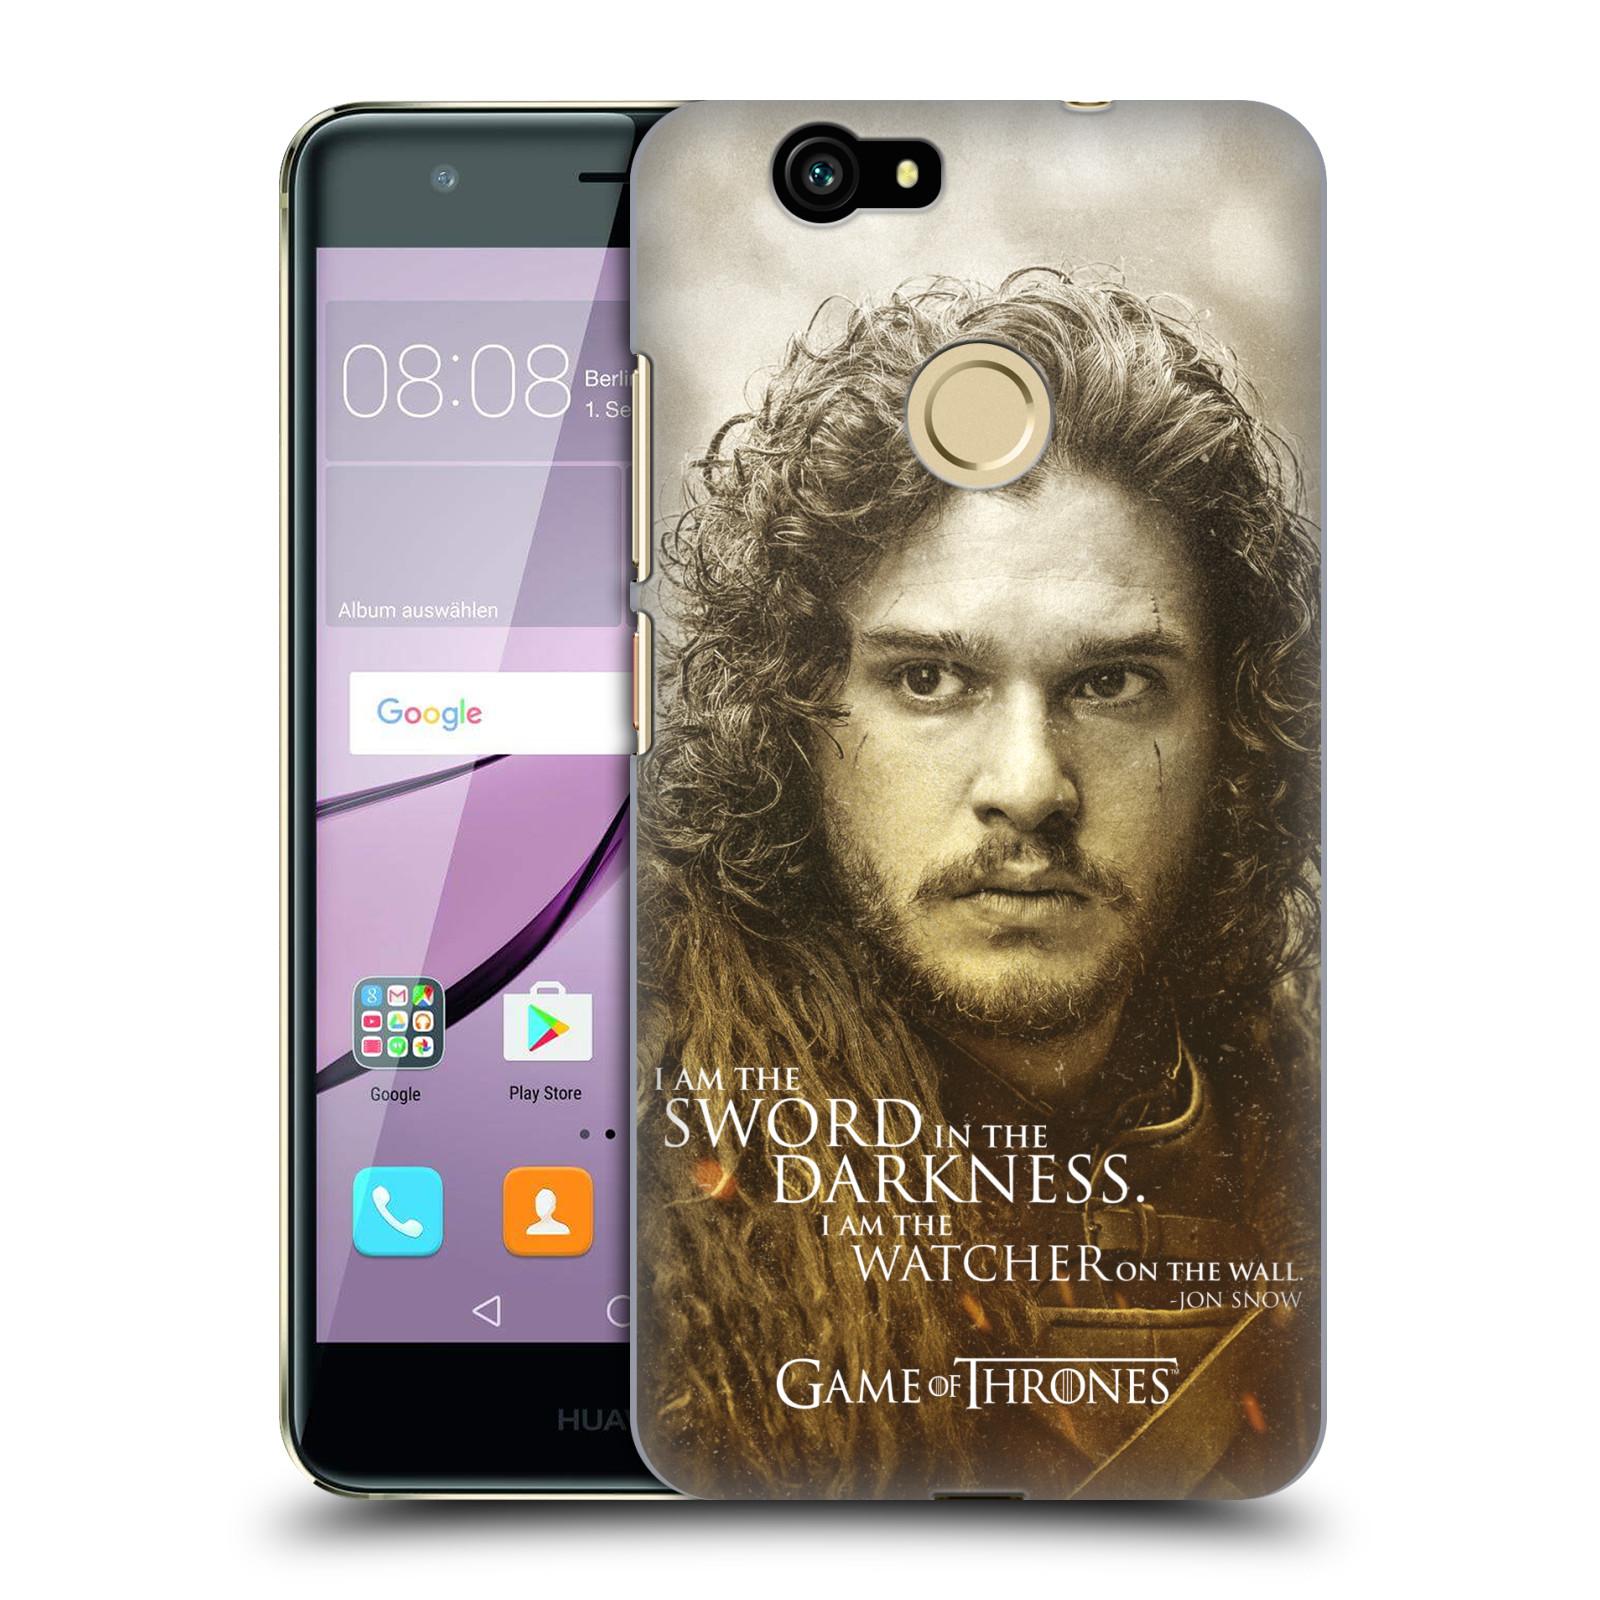 Plastové pouzdro na mobil Huawei Nova HEAD CASE Hra o trůny - Jon Snow (Plastový kryt či obal na mobilní telefon s licencovaným motivem Hra o trůny - Game Of Thrones pro Huawei Nova)